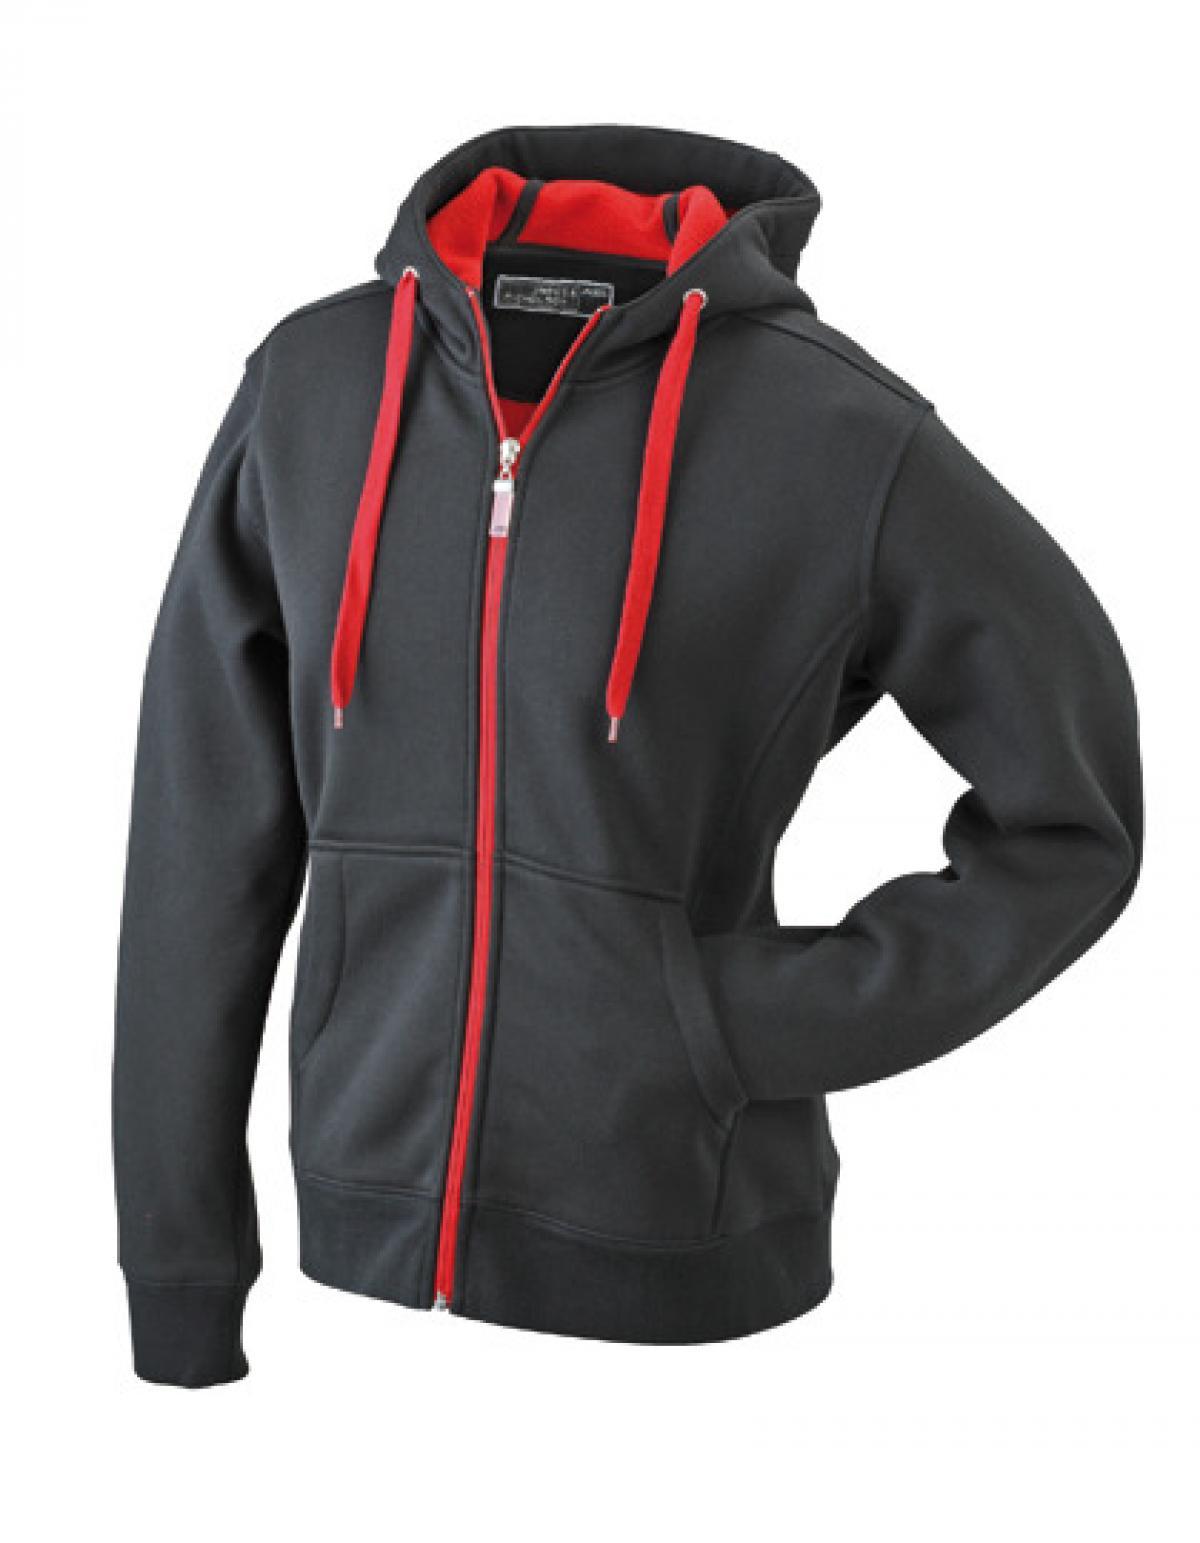 damen doubleface jacket hoodie mit kaputze rexlander s. Black Bedroom Furniture Sets. Home Design Ideas